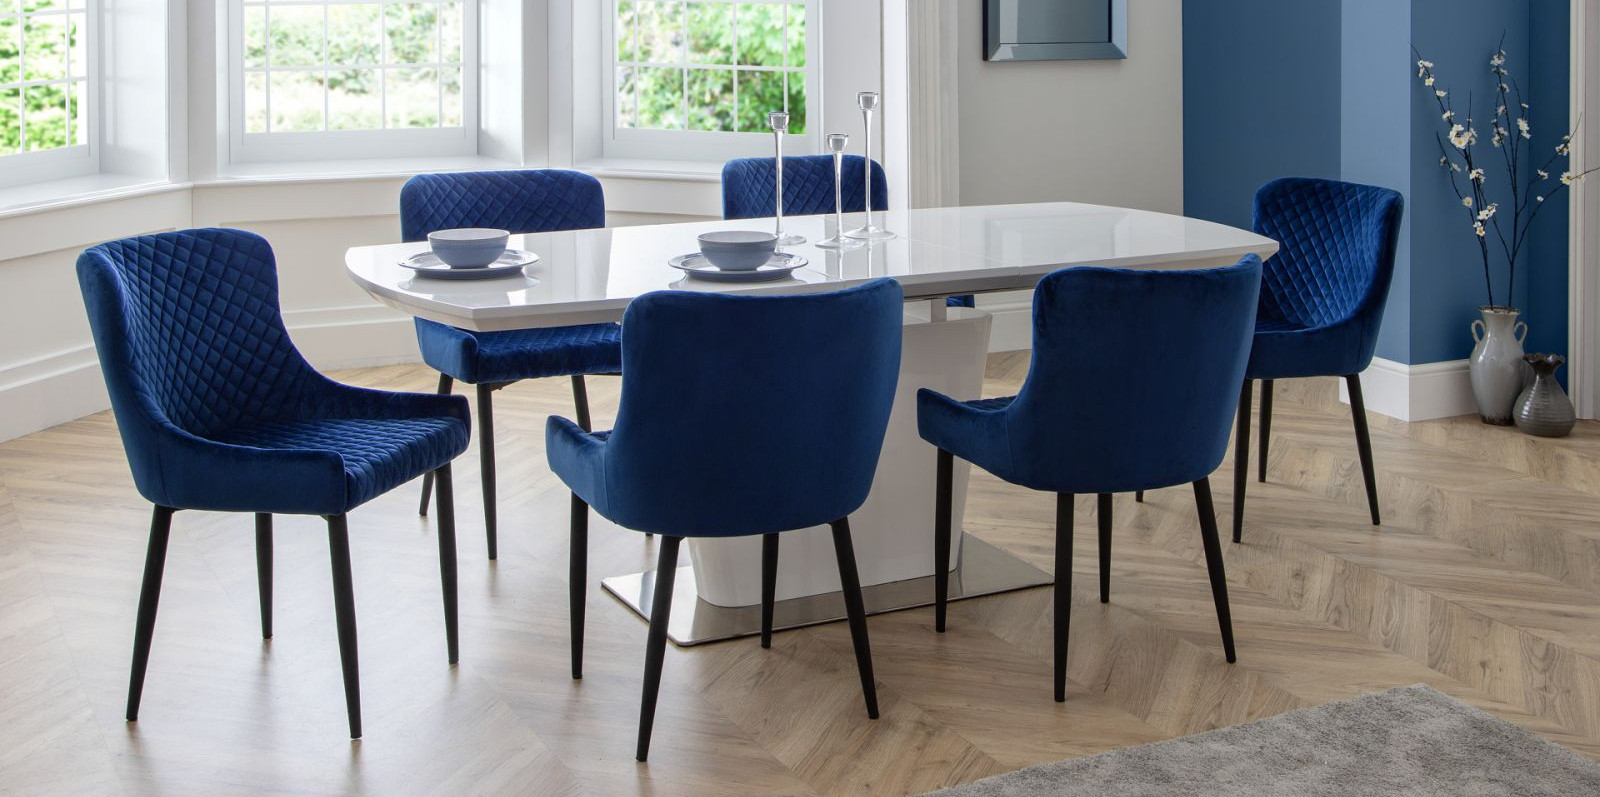 dining-chairs.jpg